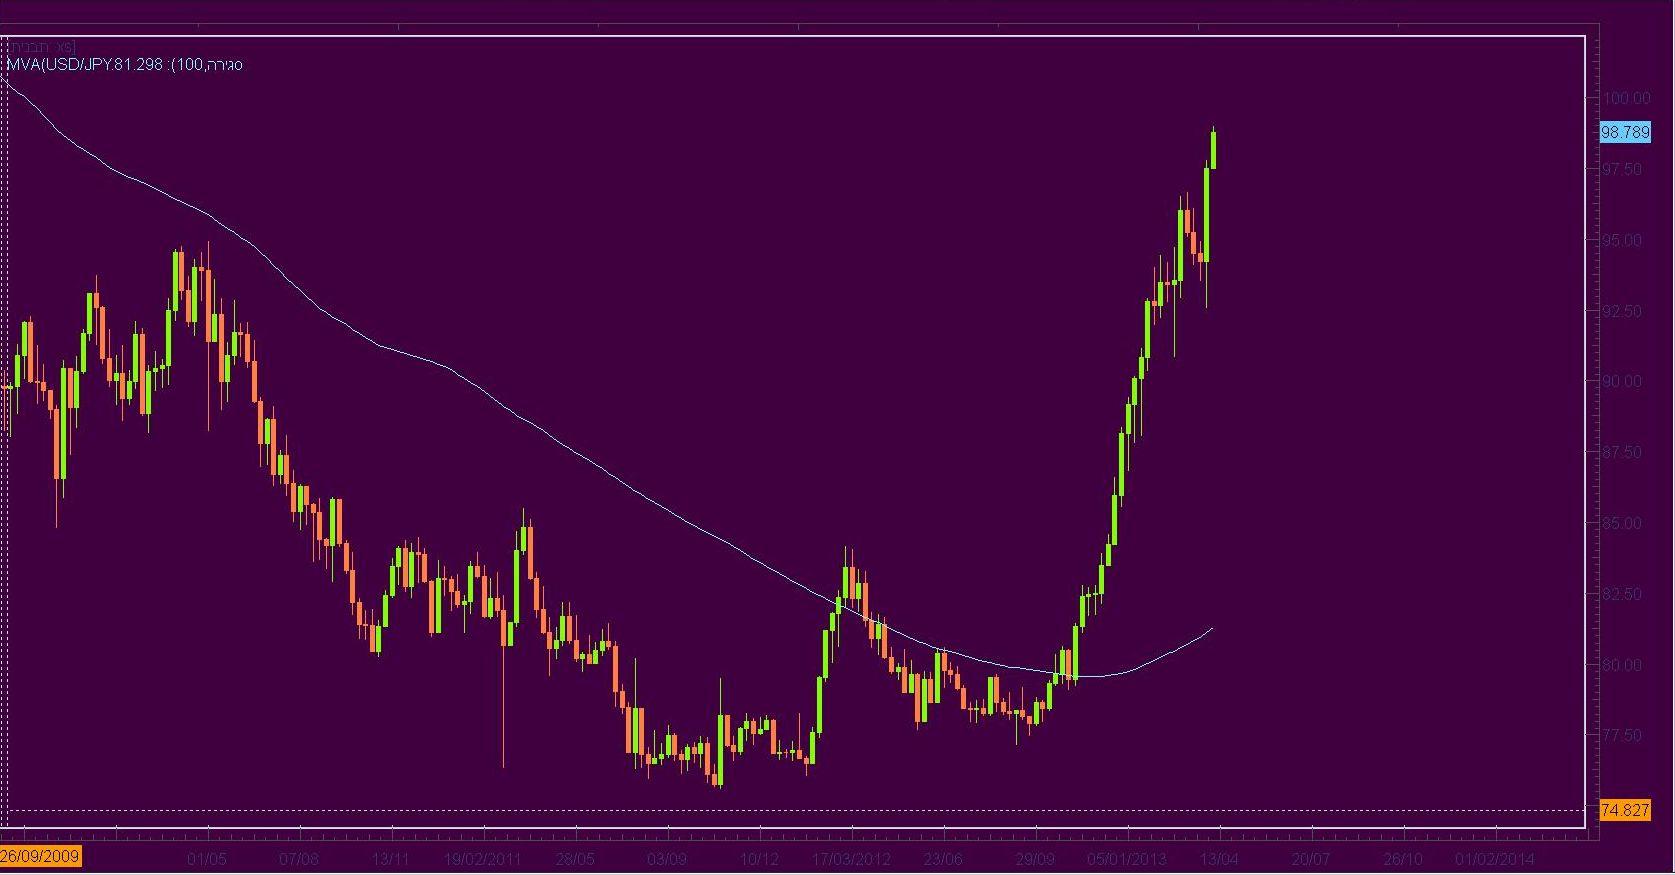 גרף דולר / ין; באדיבות FXCM